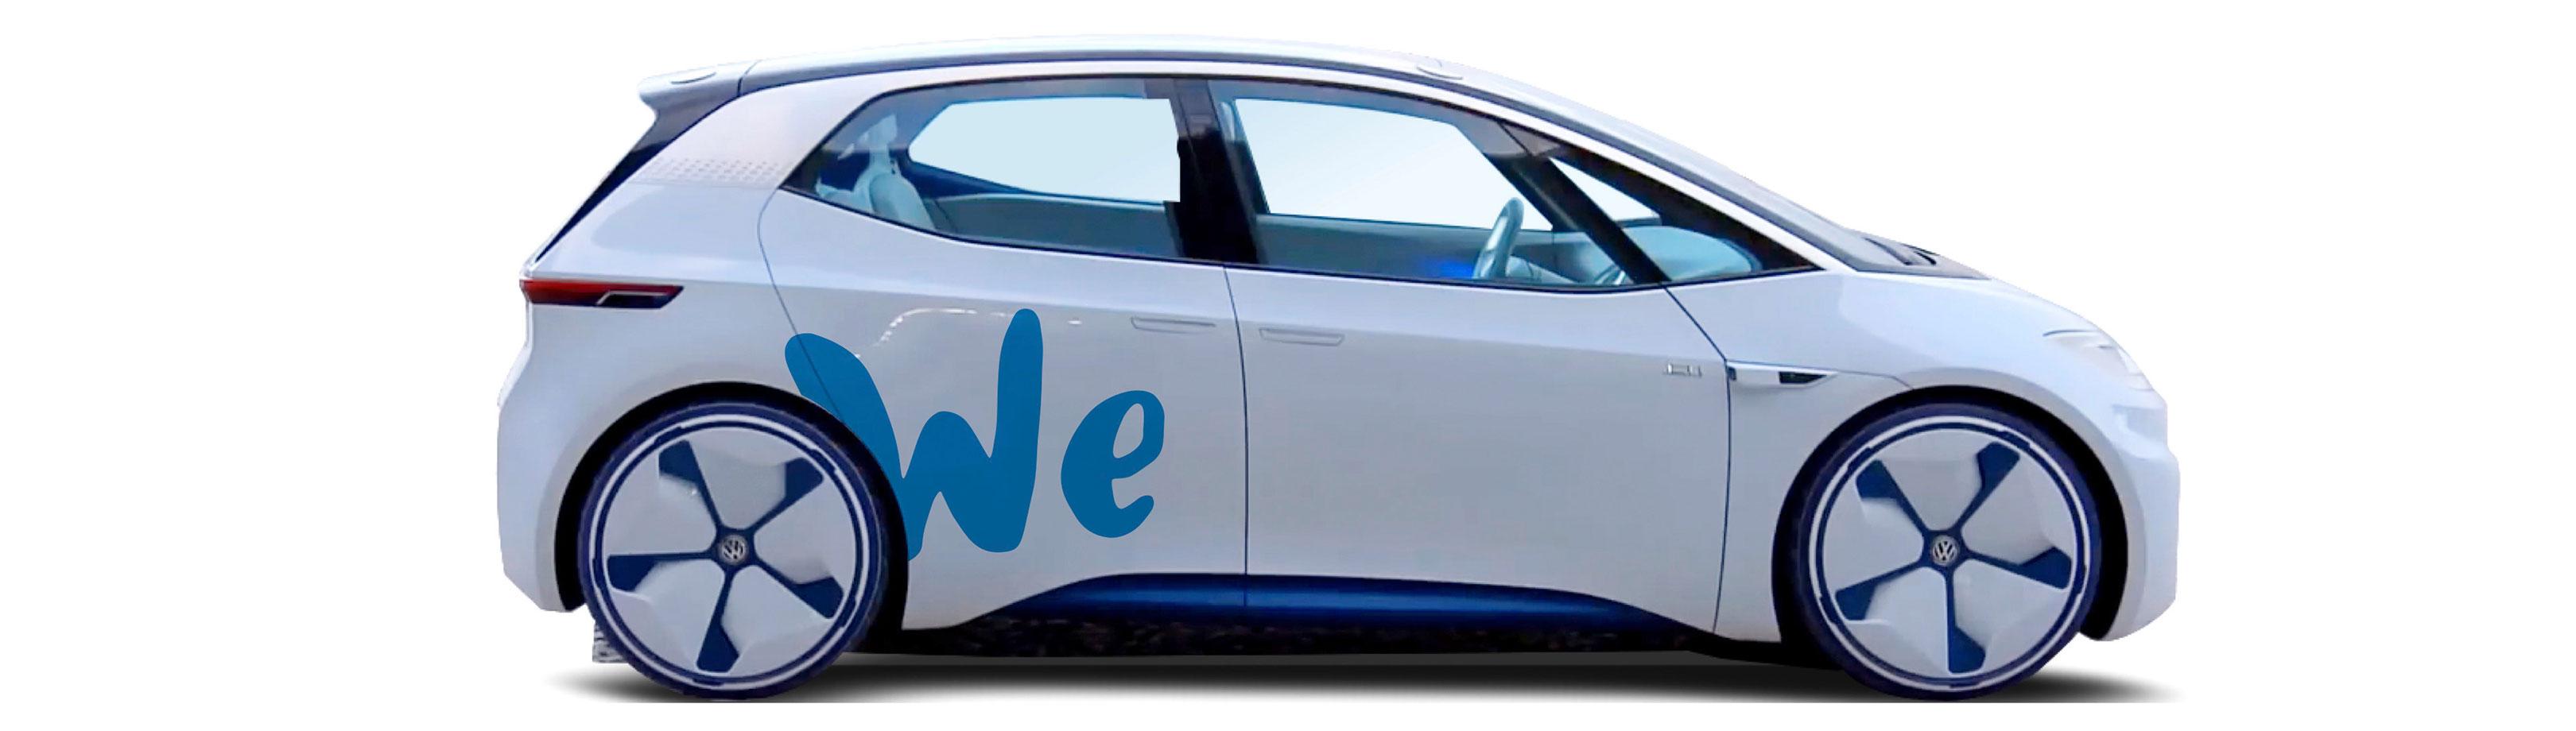 volkswagen  offer  emission car sharing services  future